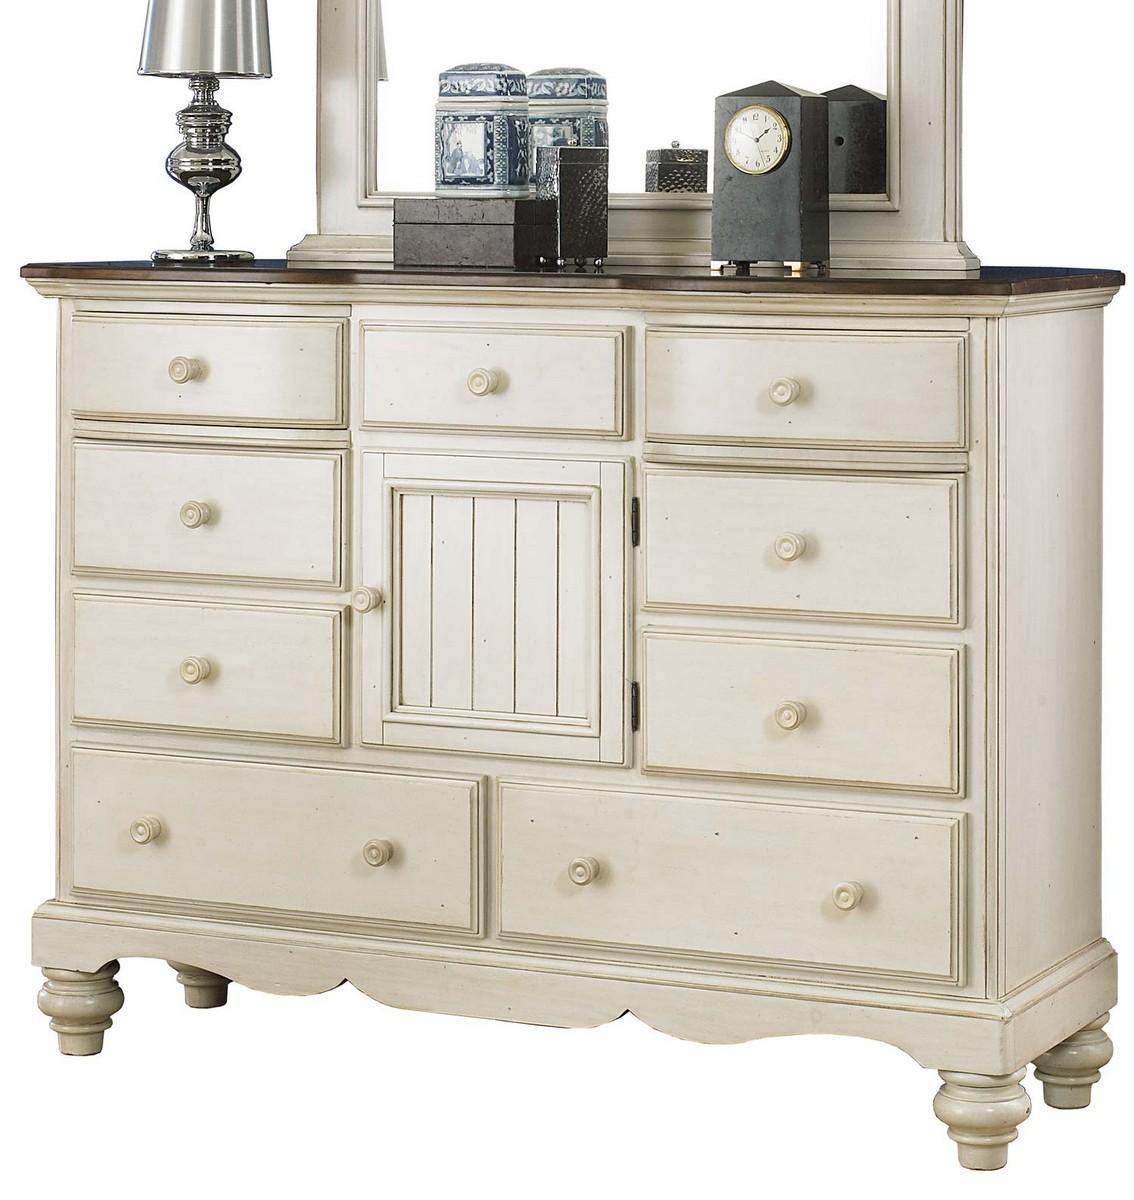 Hillsdale Pine Island Mule Dresser - Old White